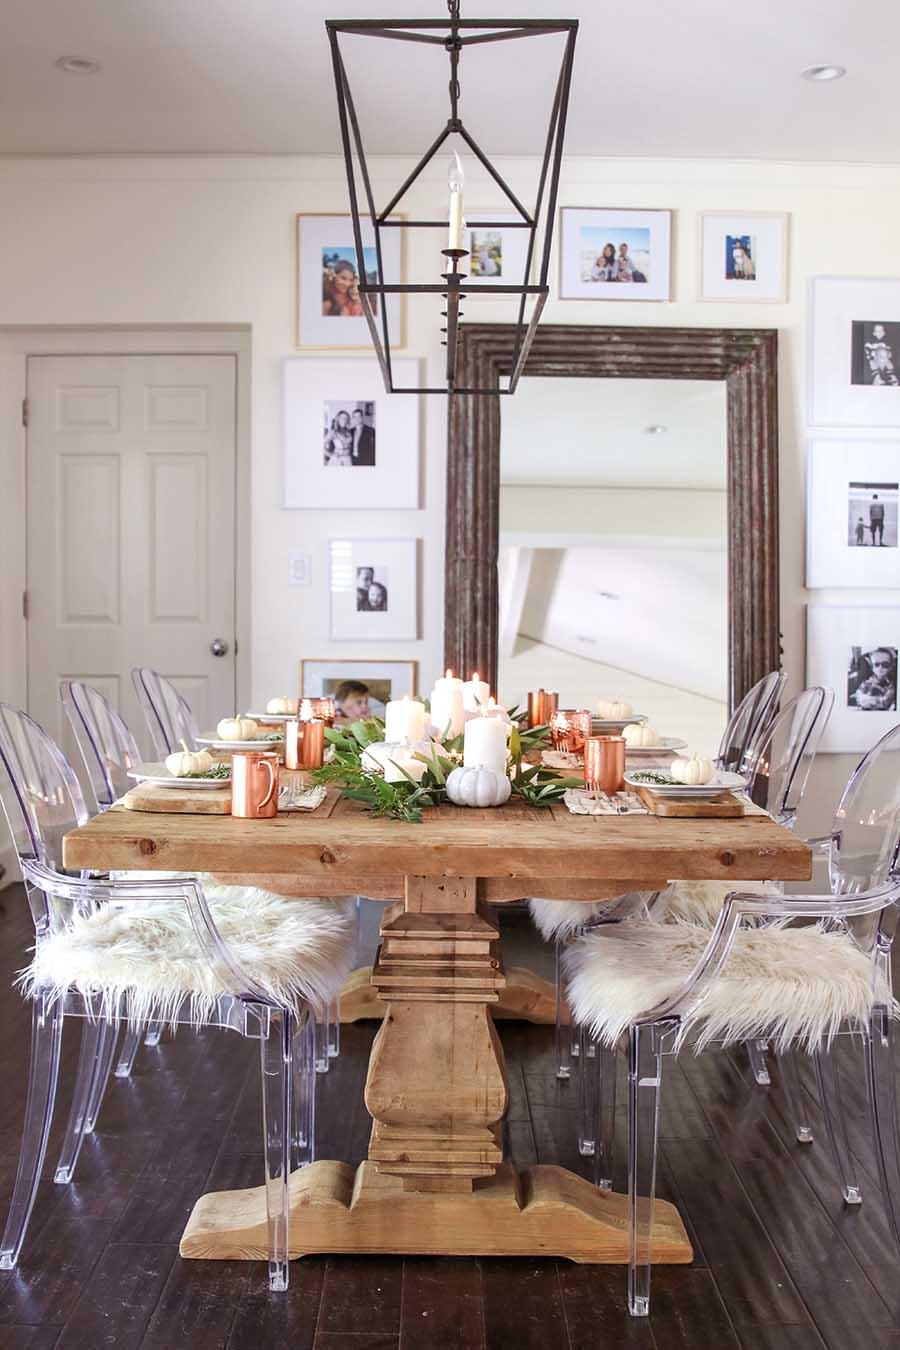 Modern Farmhouse Fall Dining Room Decor - Fall Home Tour